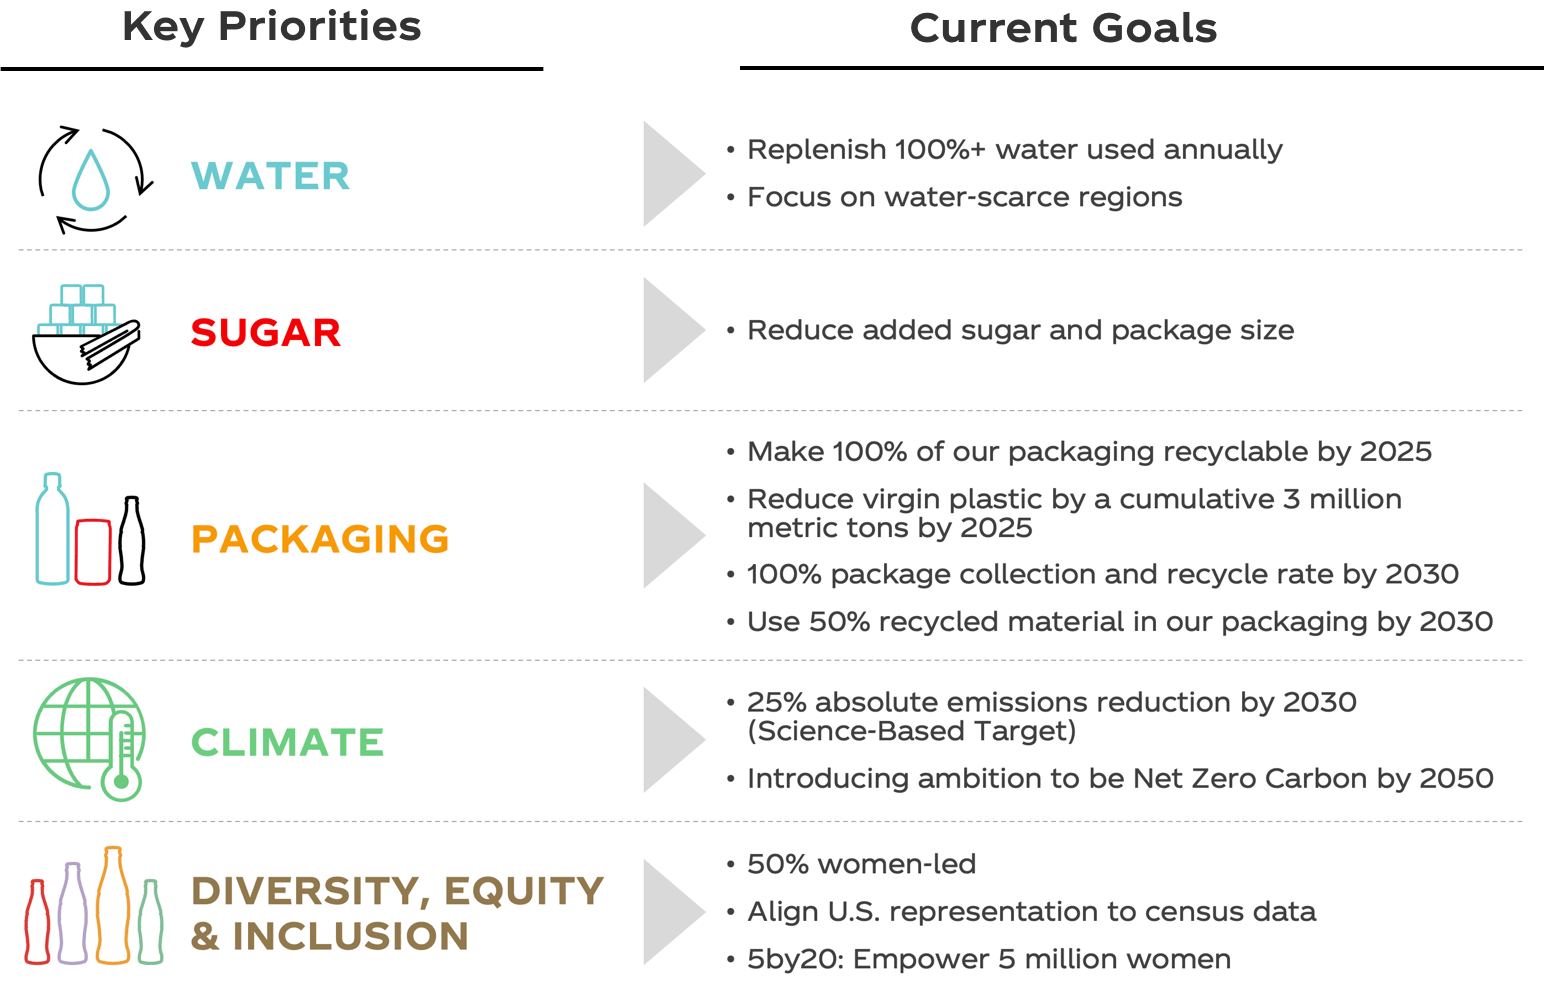 Key Priorities & Current Goals